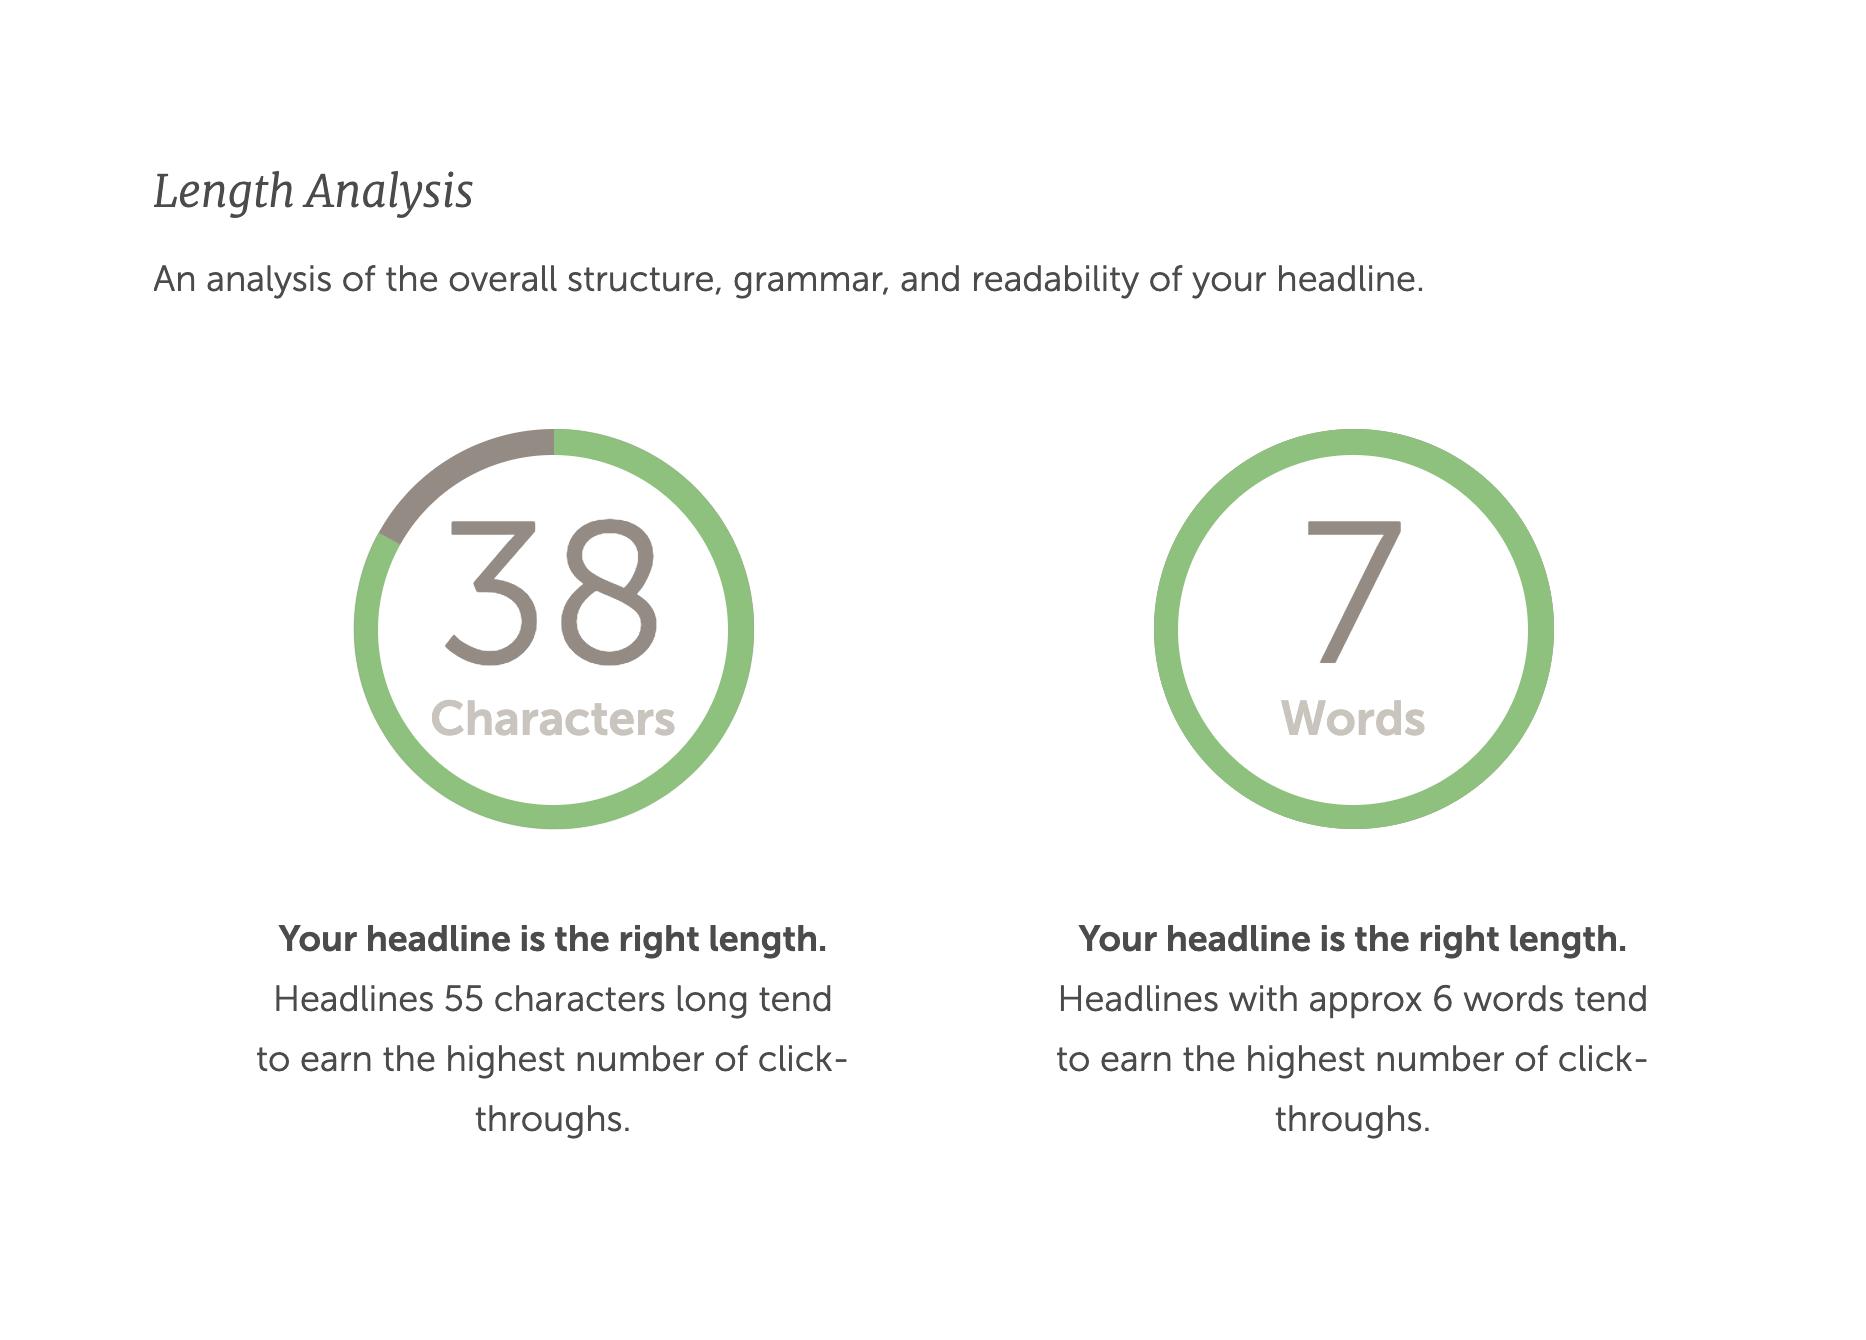 CoSchedule's Free Headline Analyzer Tool